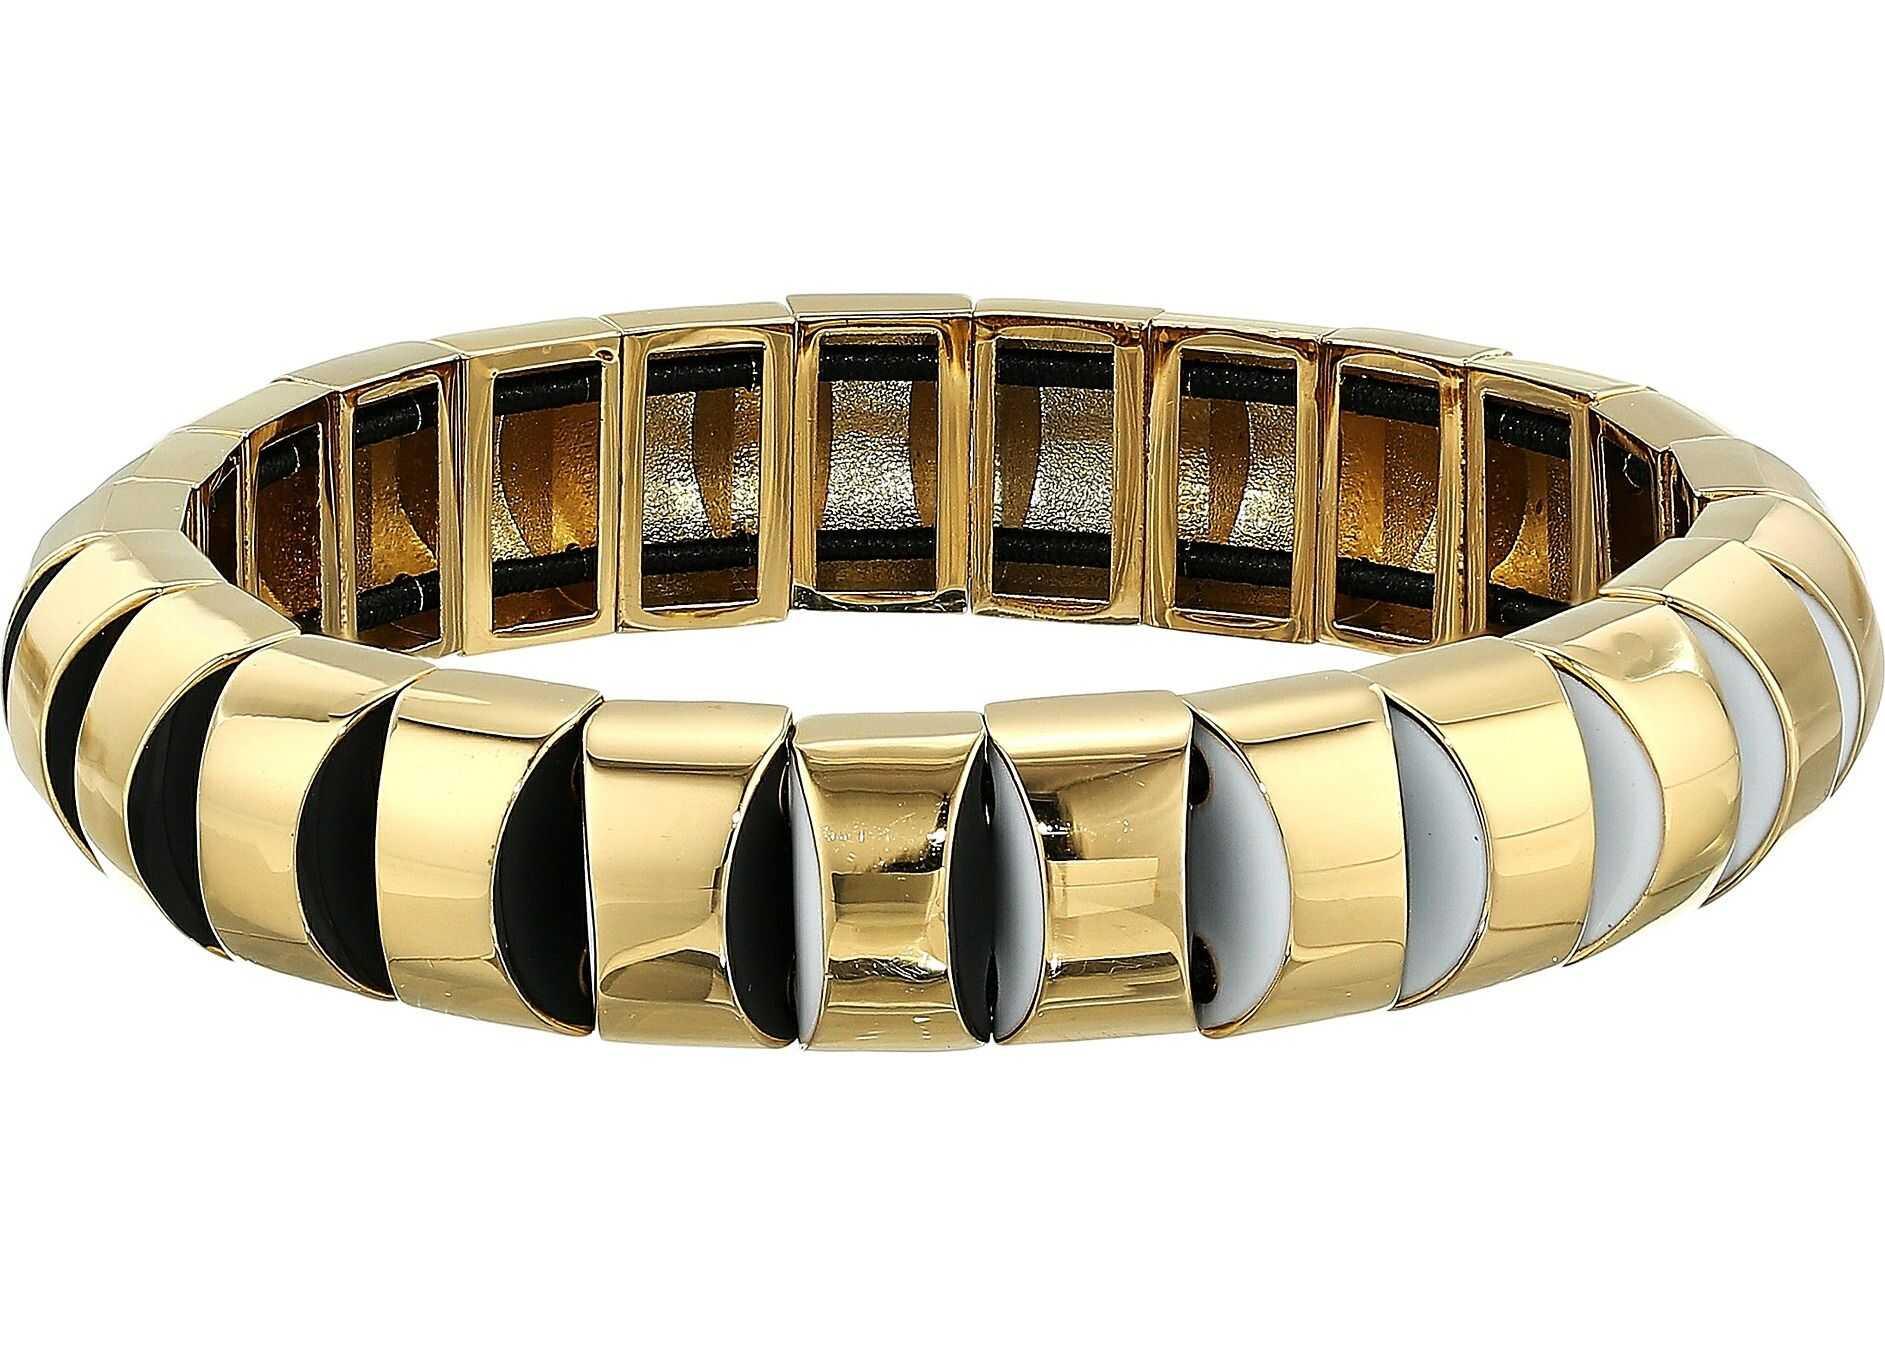 Kate Spade New York Sliced Scallops Small Metal Stretch Bracelet Neutral Multi